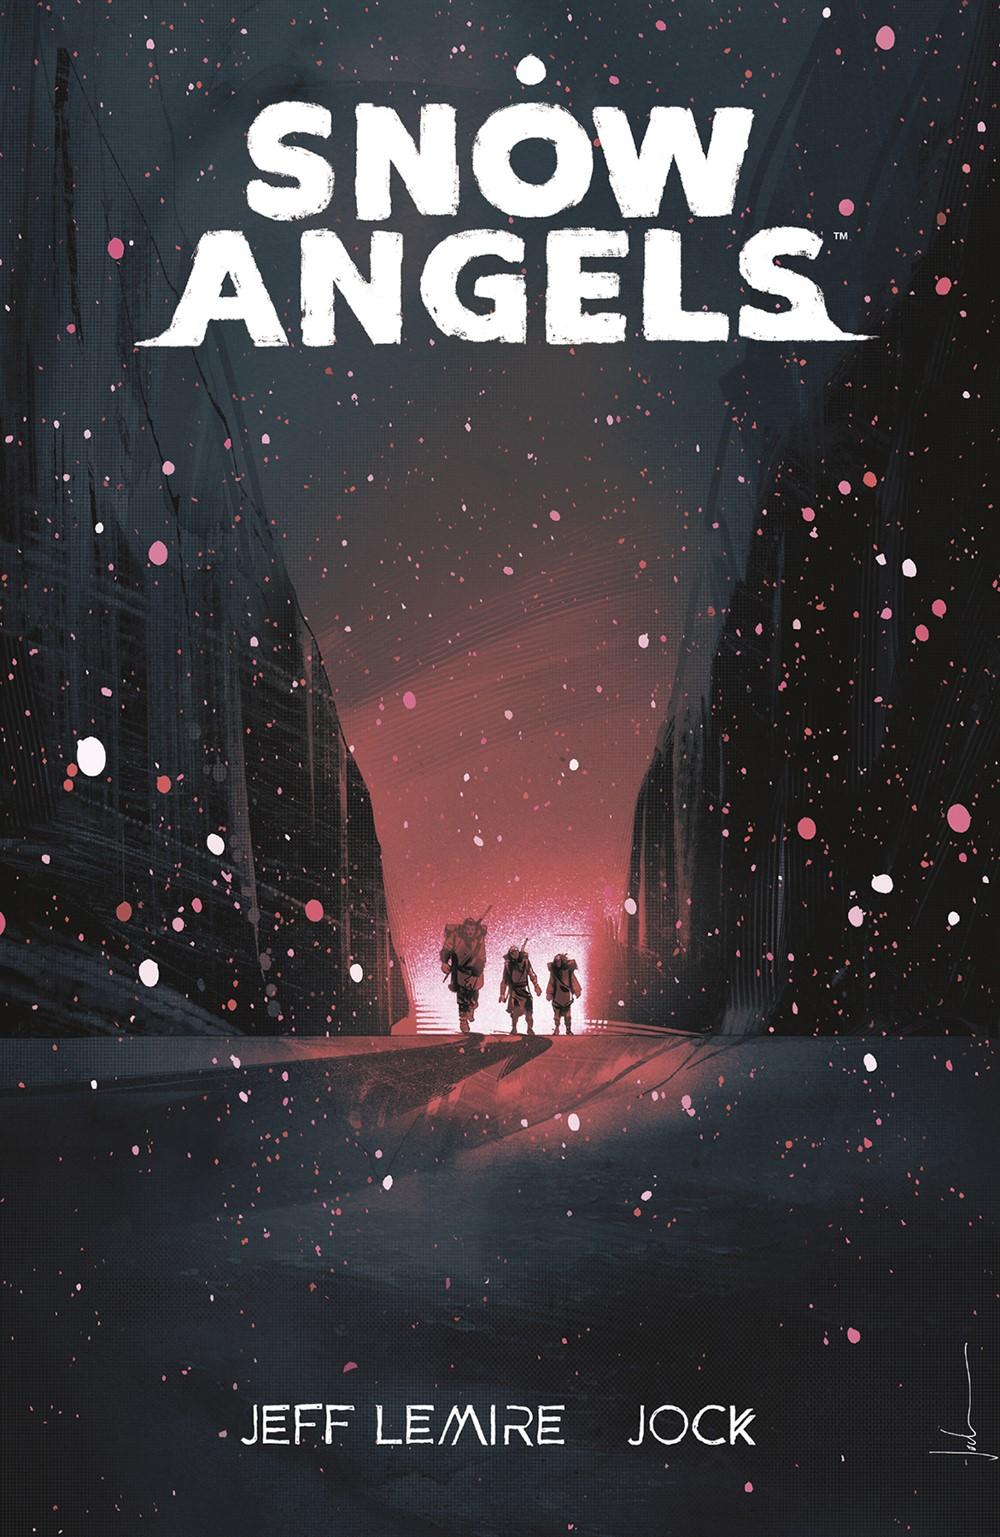 SNWANGELSV1_CVR_4x6_SOL Dark Horse Comics December 2021 Solicitations